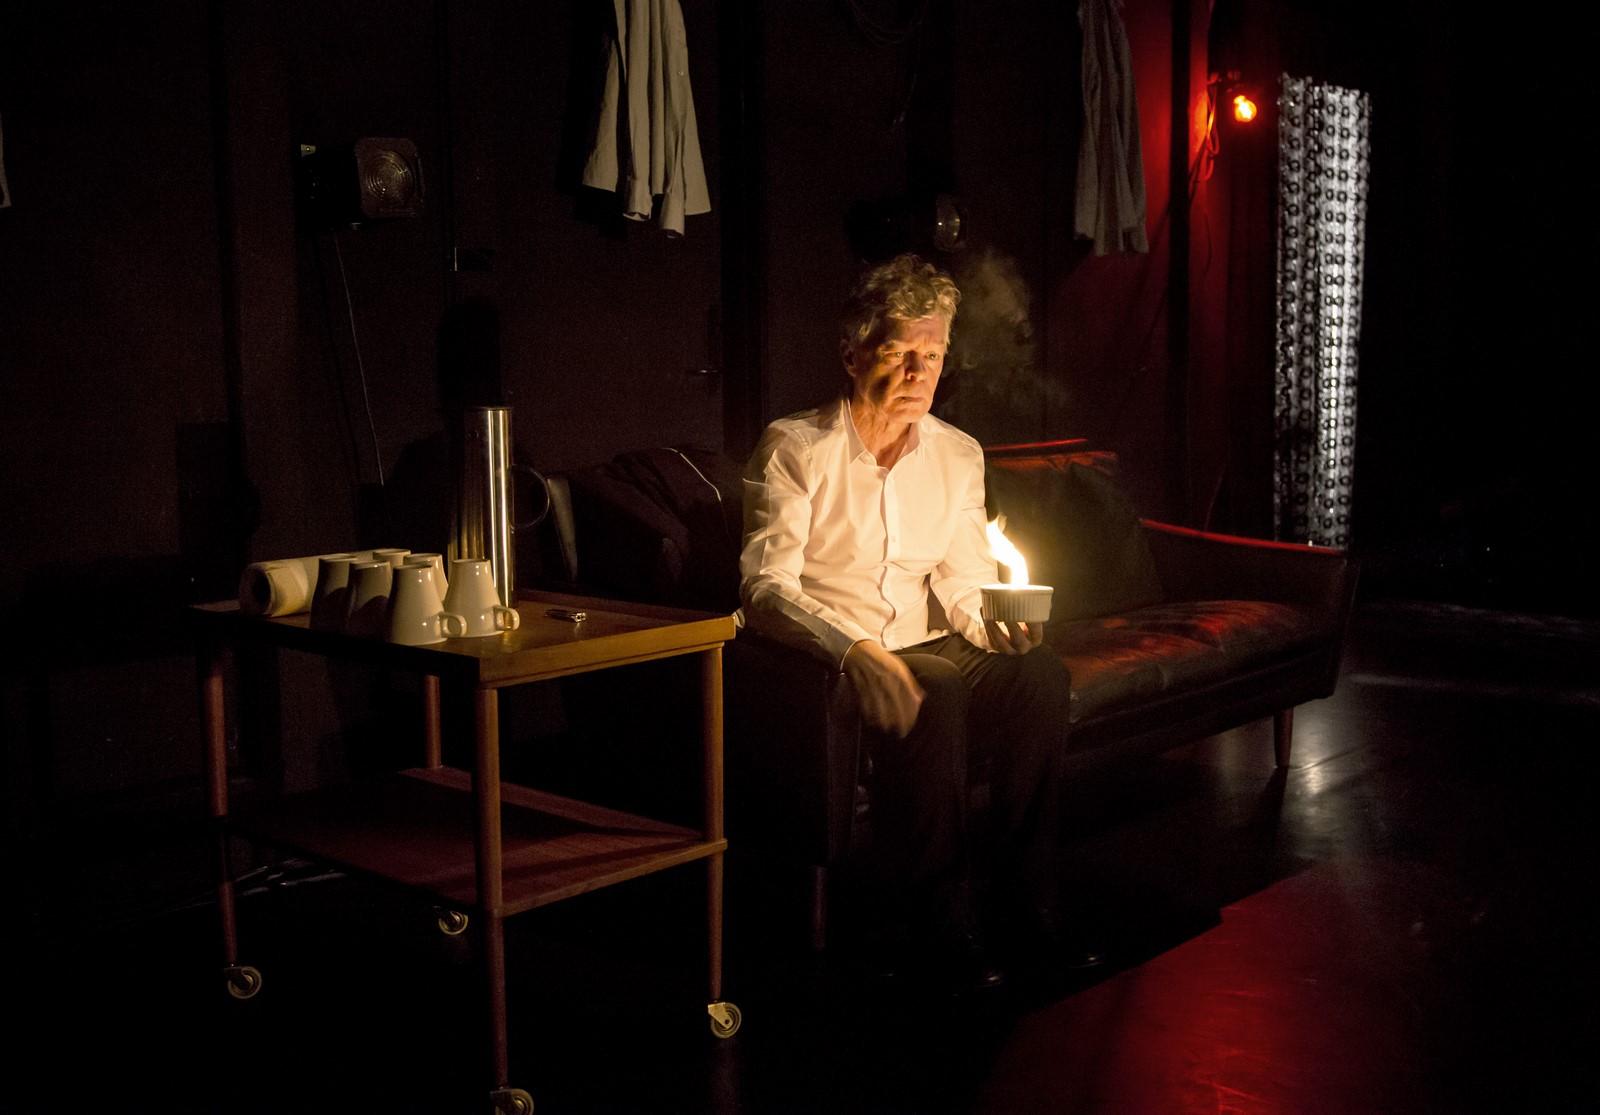 Anmeldelse: Kom du?, Husets Teater (Teater Rio Rose)